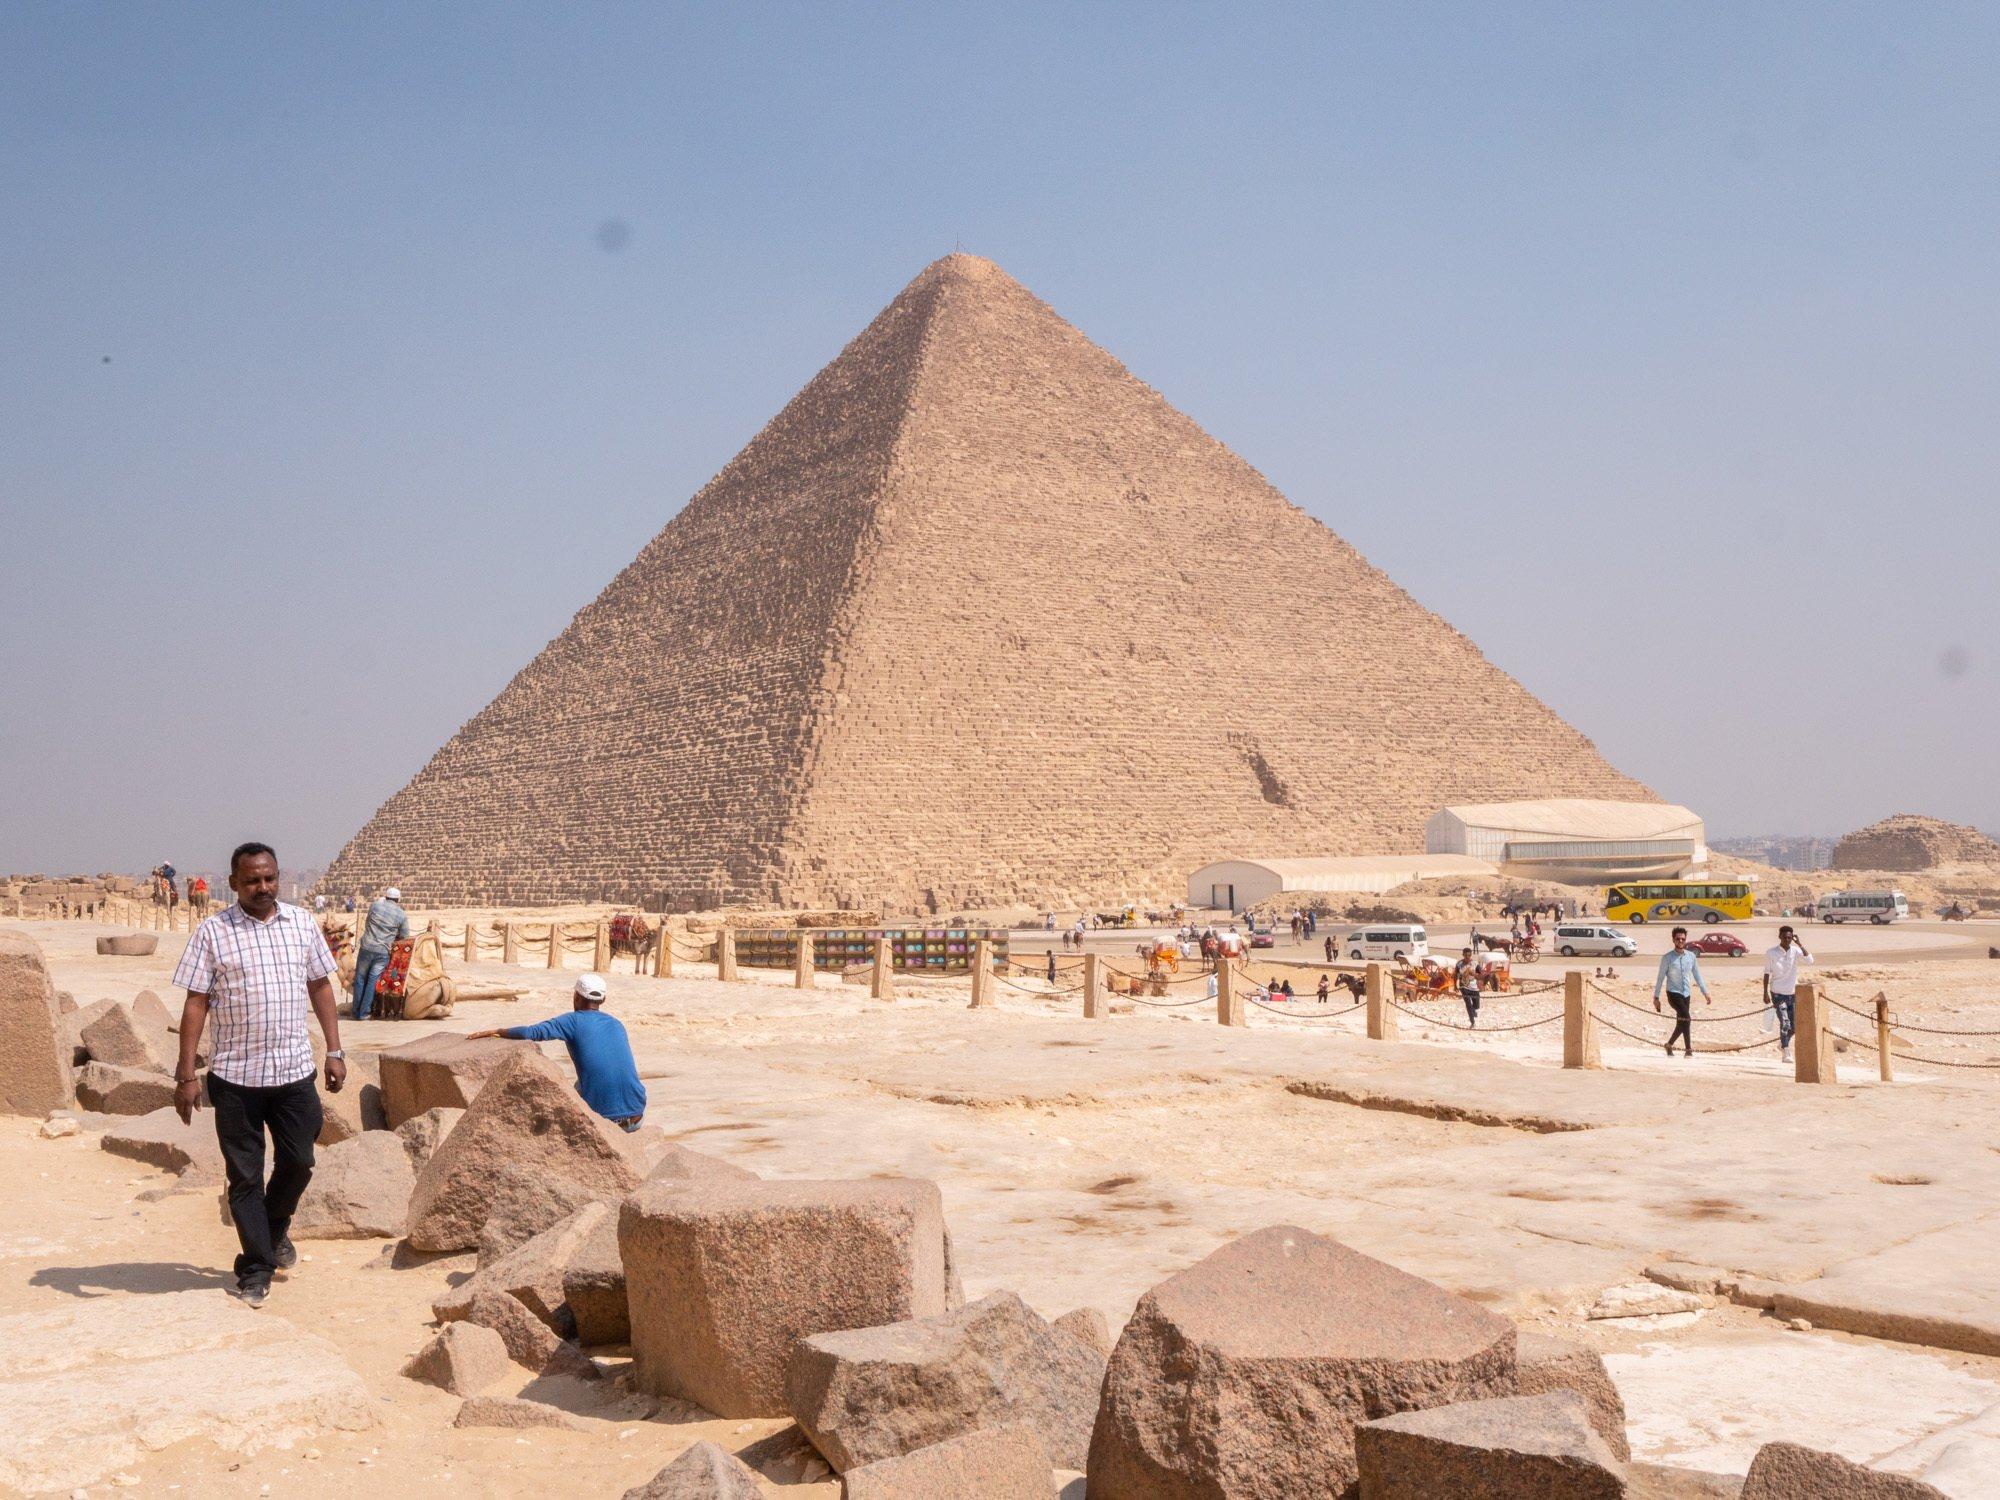 The pyramids in Cairo